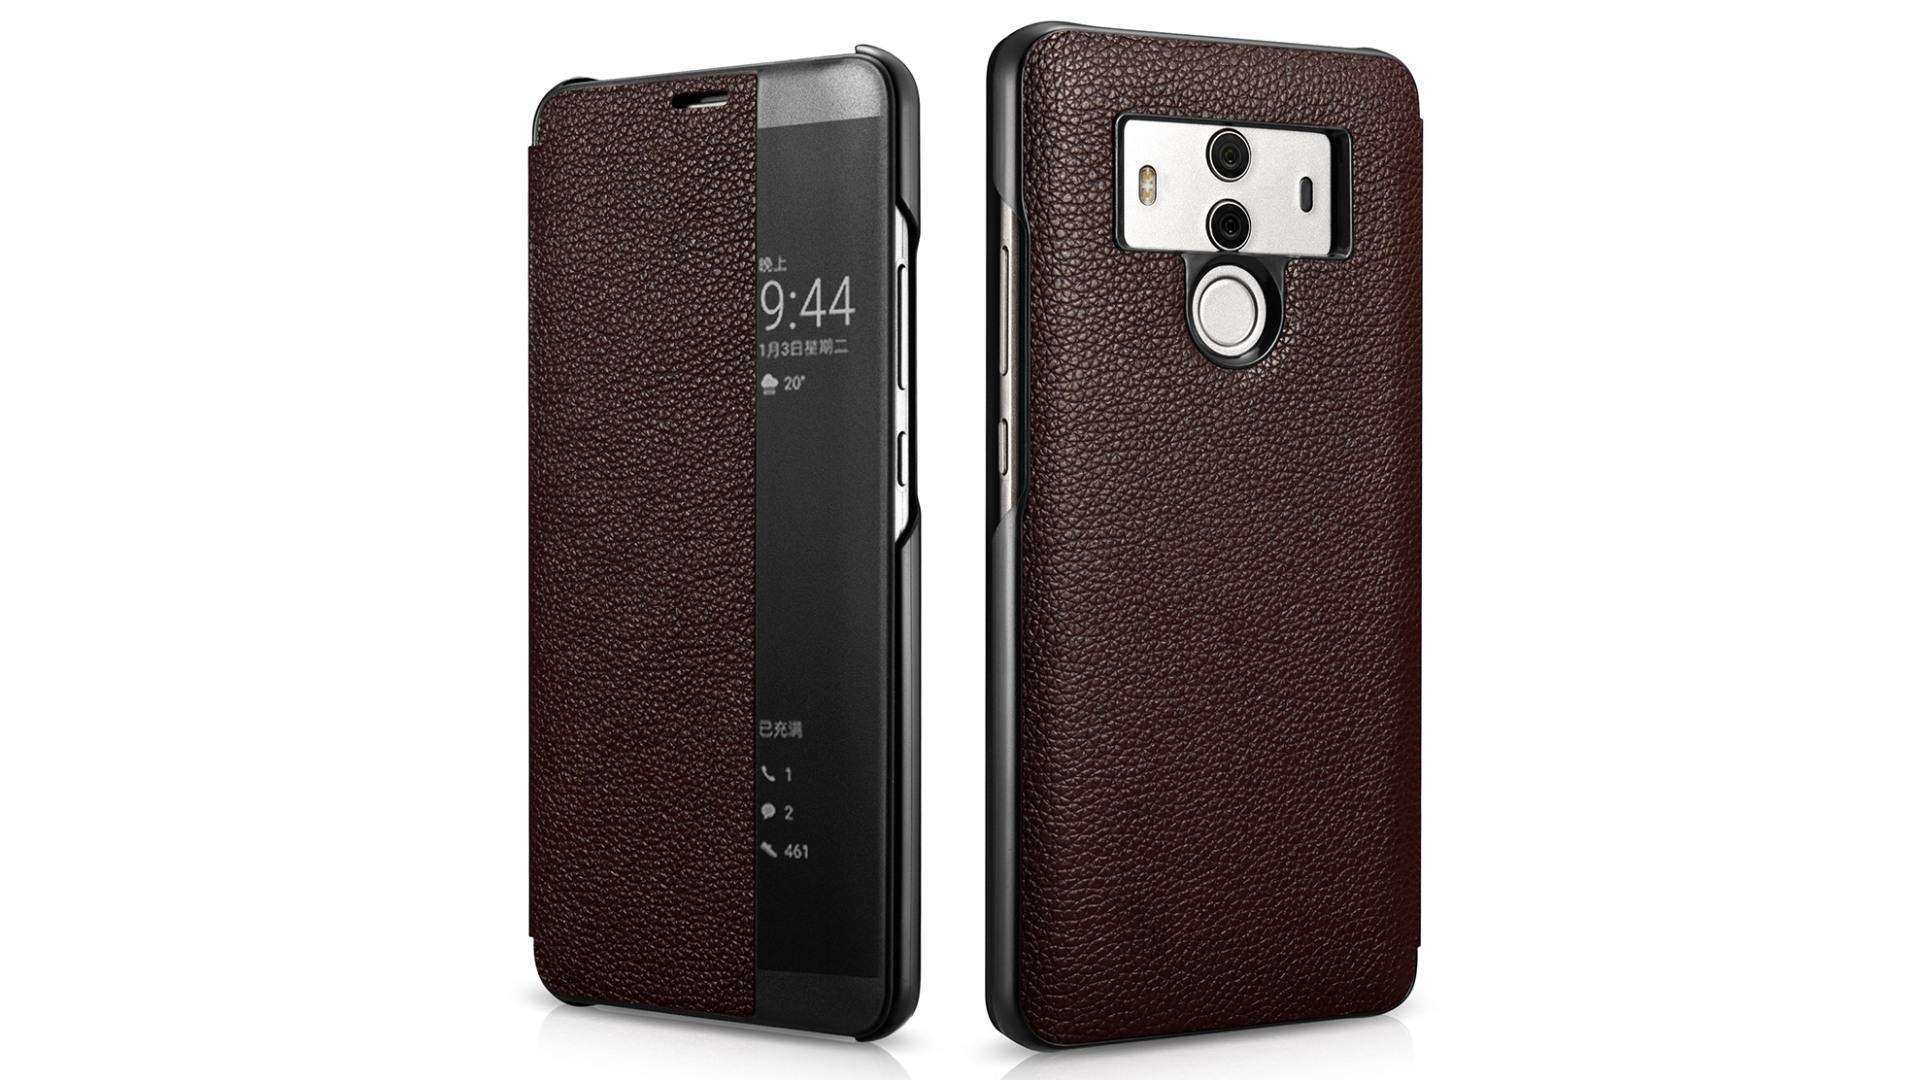 Husa slim piele naturala, smart cover, Huawei Mate 10 Pro, Xoomz by iCarer Litchi Smart, Maro coffee